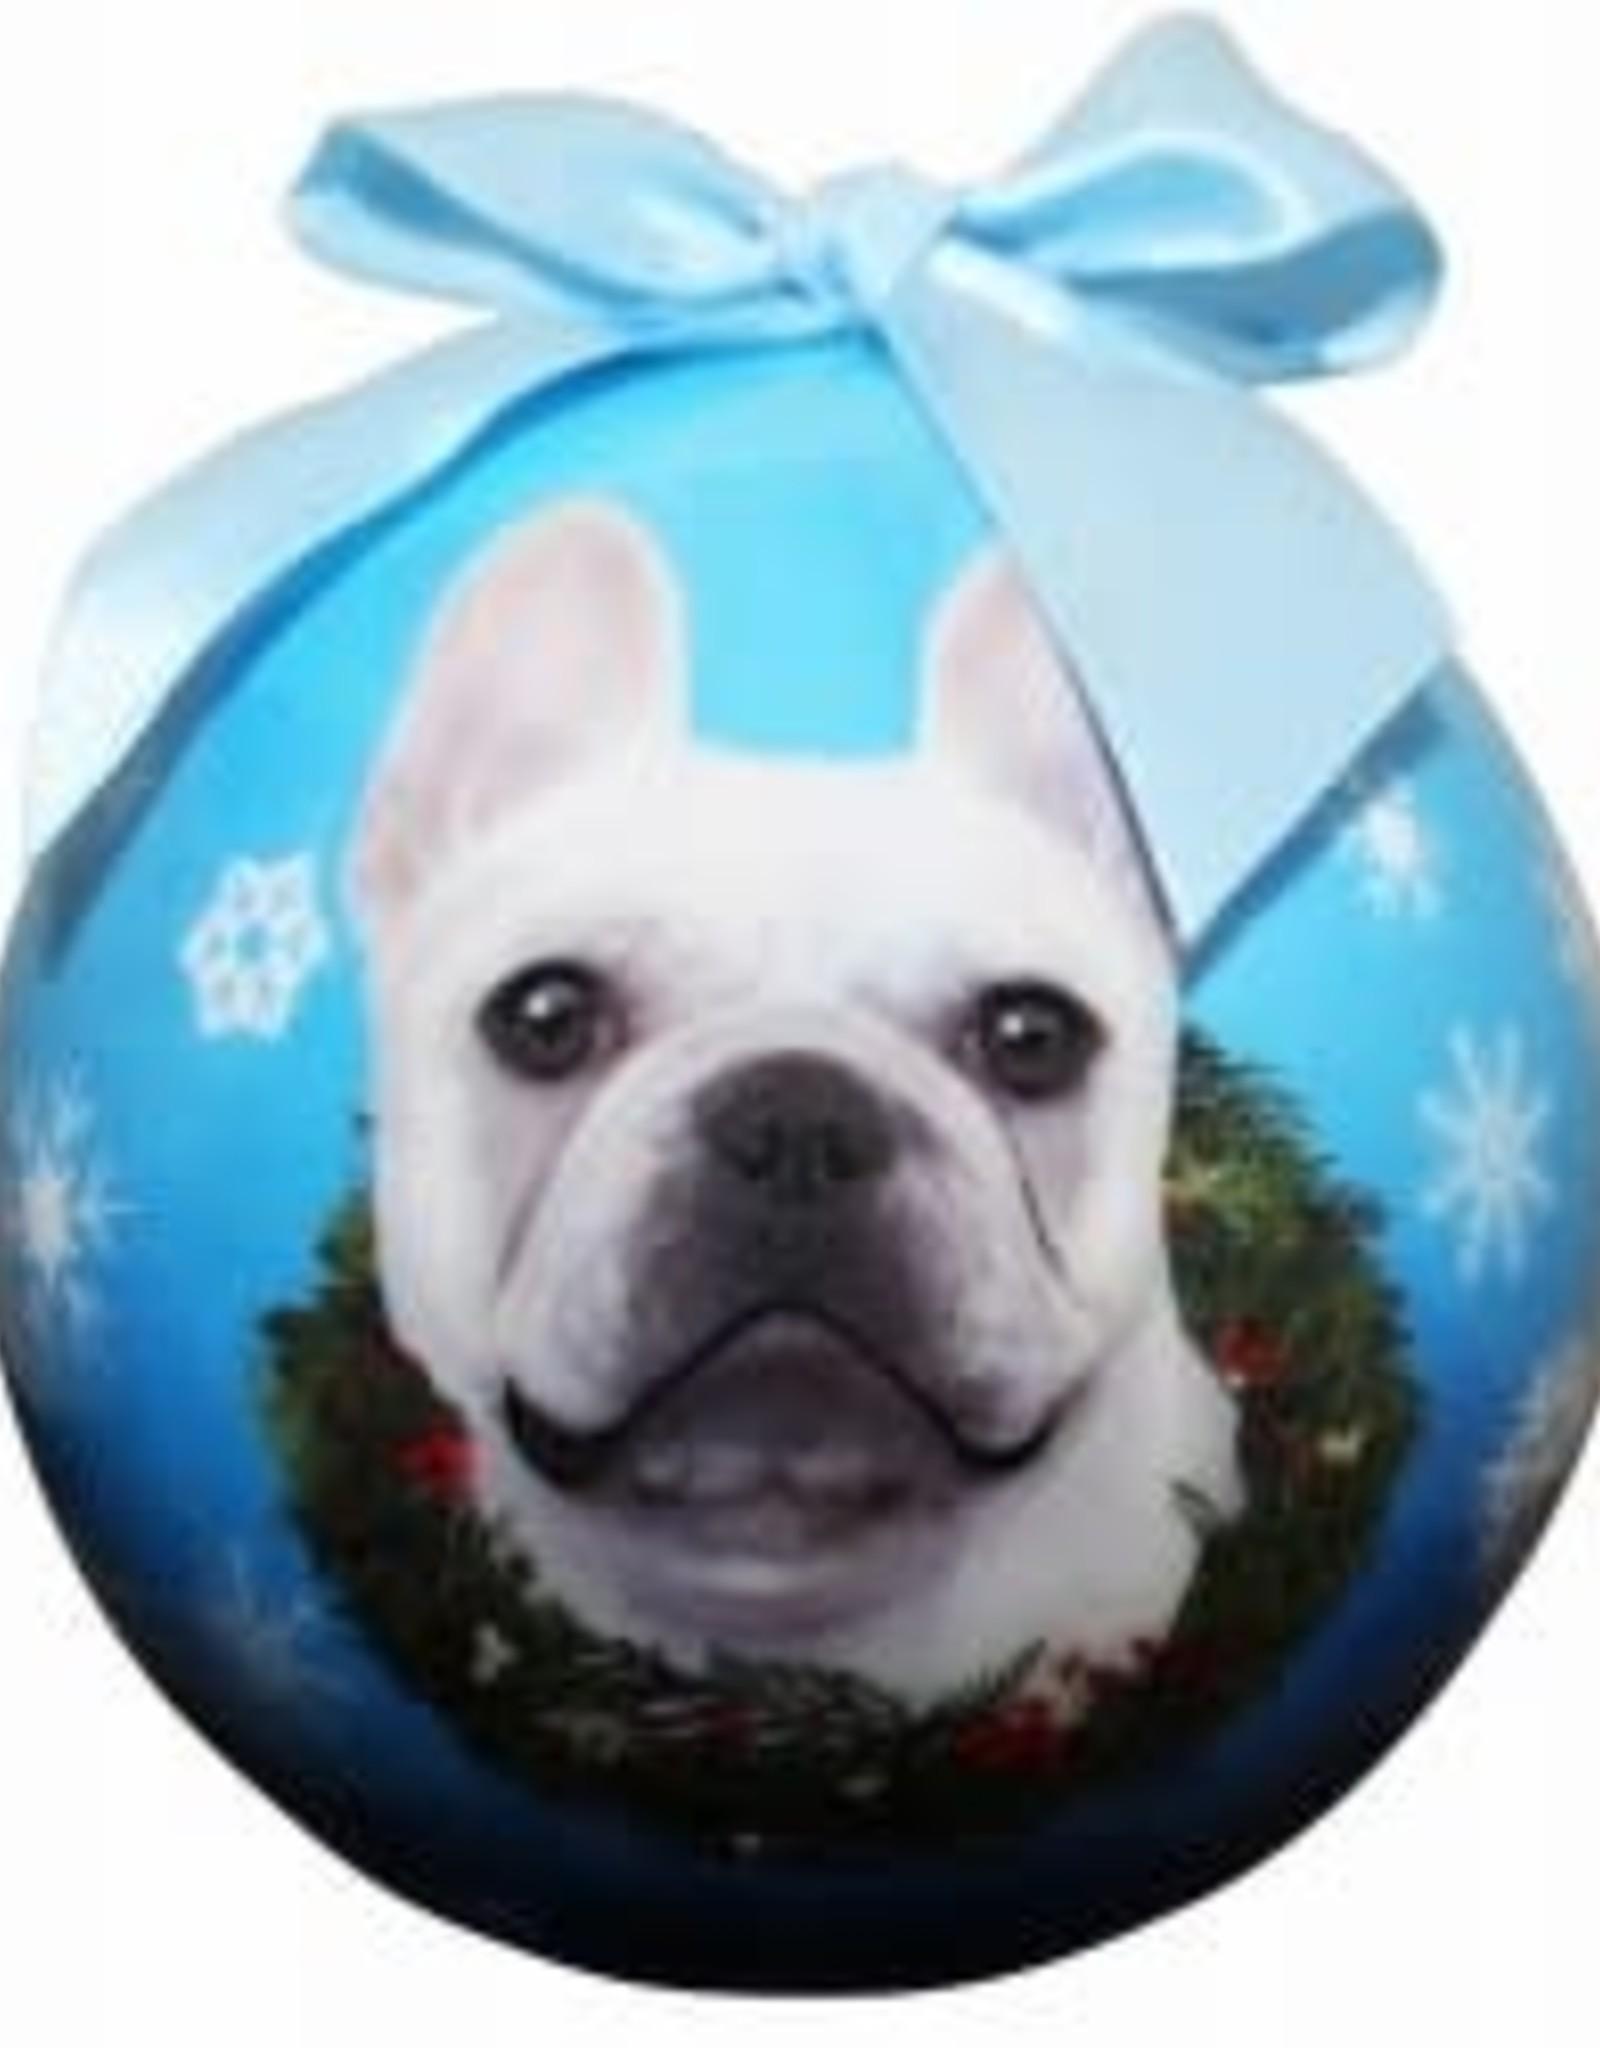 French Bulldog Ornament